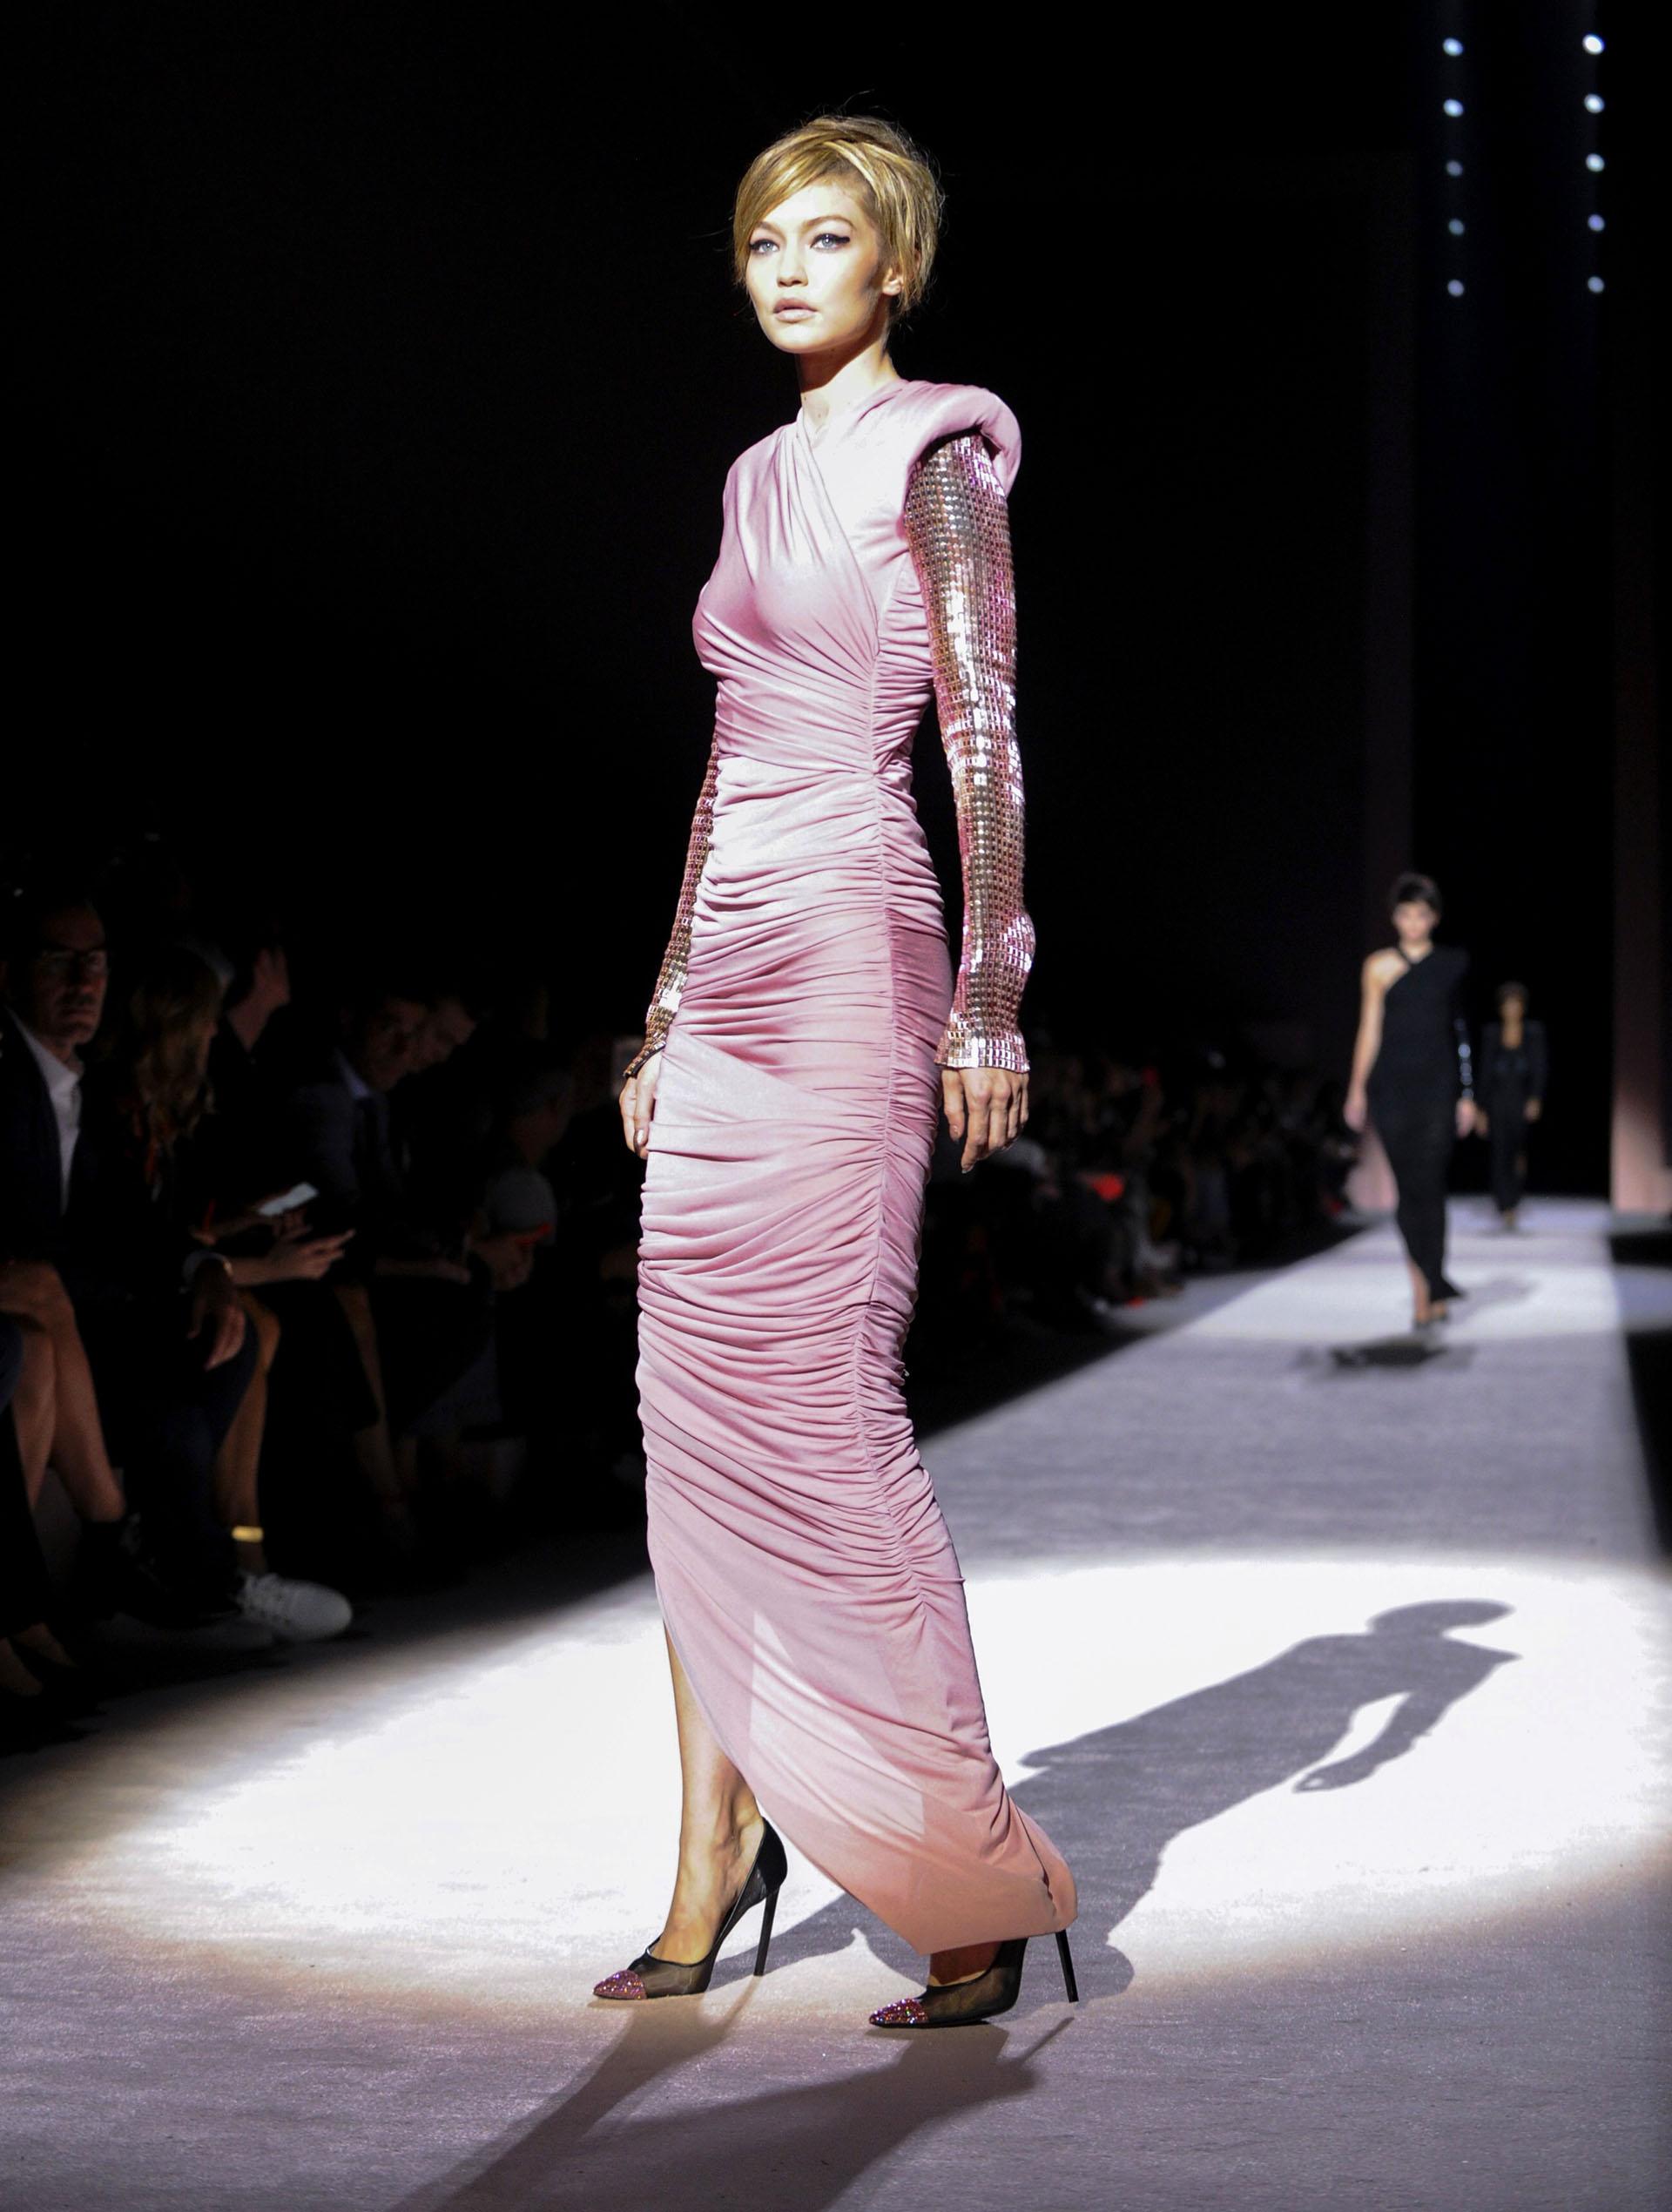 Drapeado, metalizado con mangas de paillettes rosa. Stilettos negro en punta con piedras (AP Photo/Diane Bondareff)